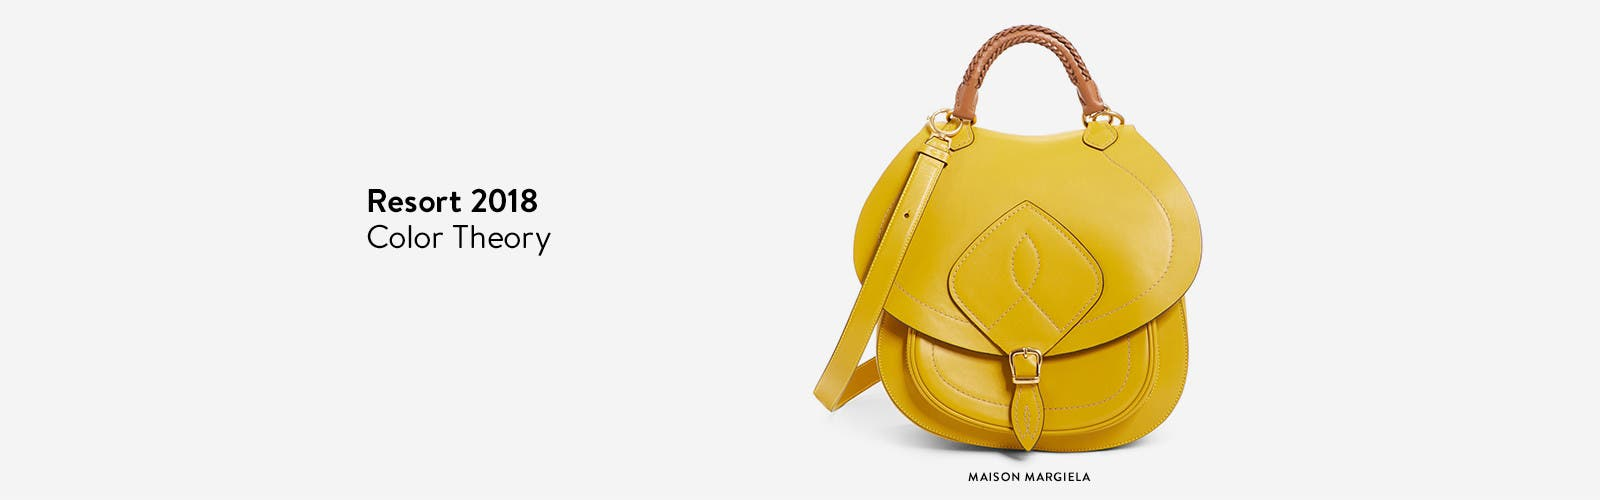 Designer resort 2018 collections to explore now: Maison Margiela top-handle saddle bag.